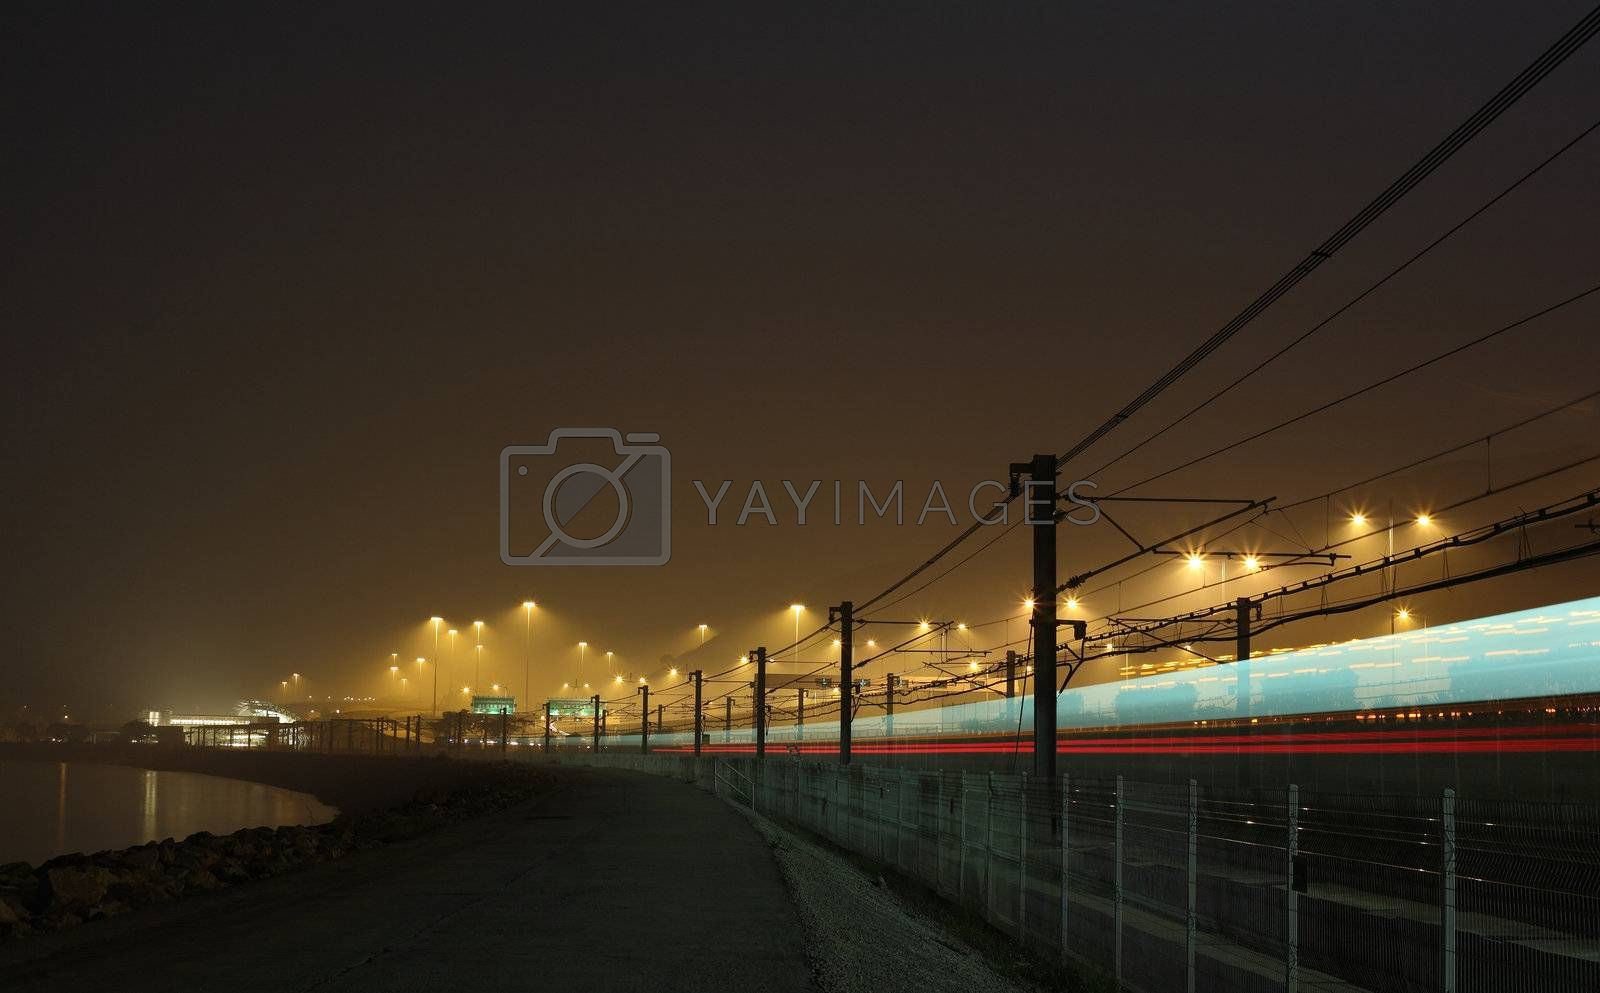 Royalty free image of railway at night by leungchopan